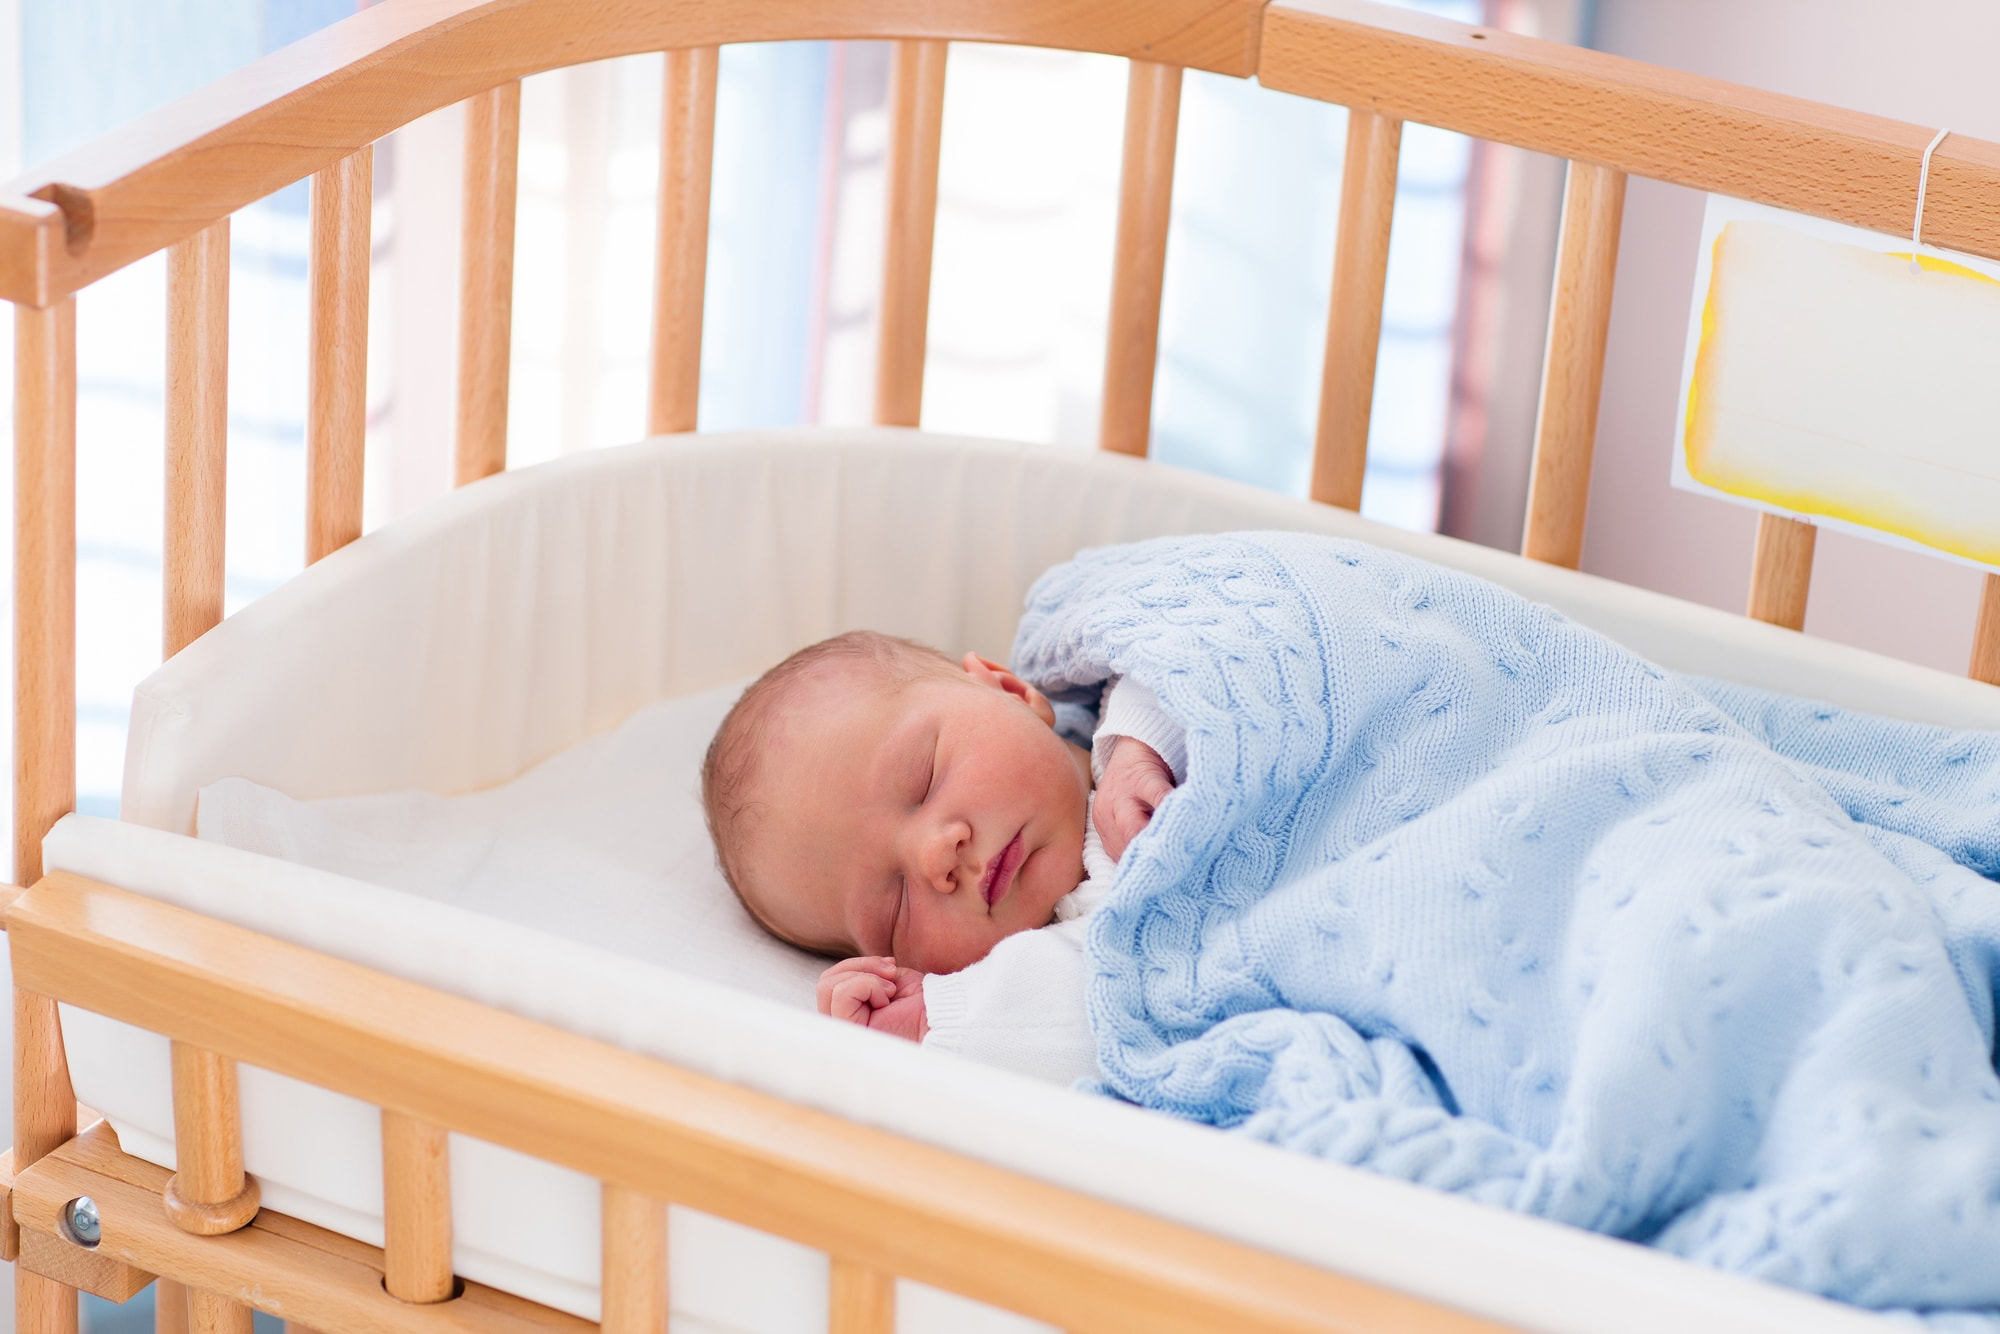 221500 como escolher a manta de bebe ideal - como-escolher-a-manta-de-bebe-ideal.jpeg